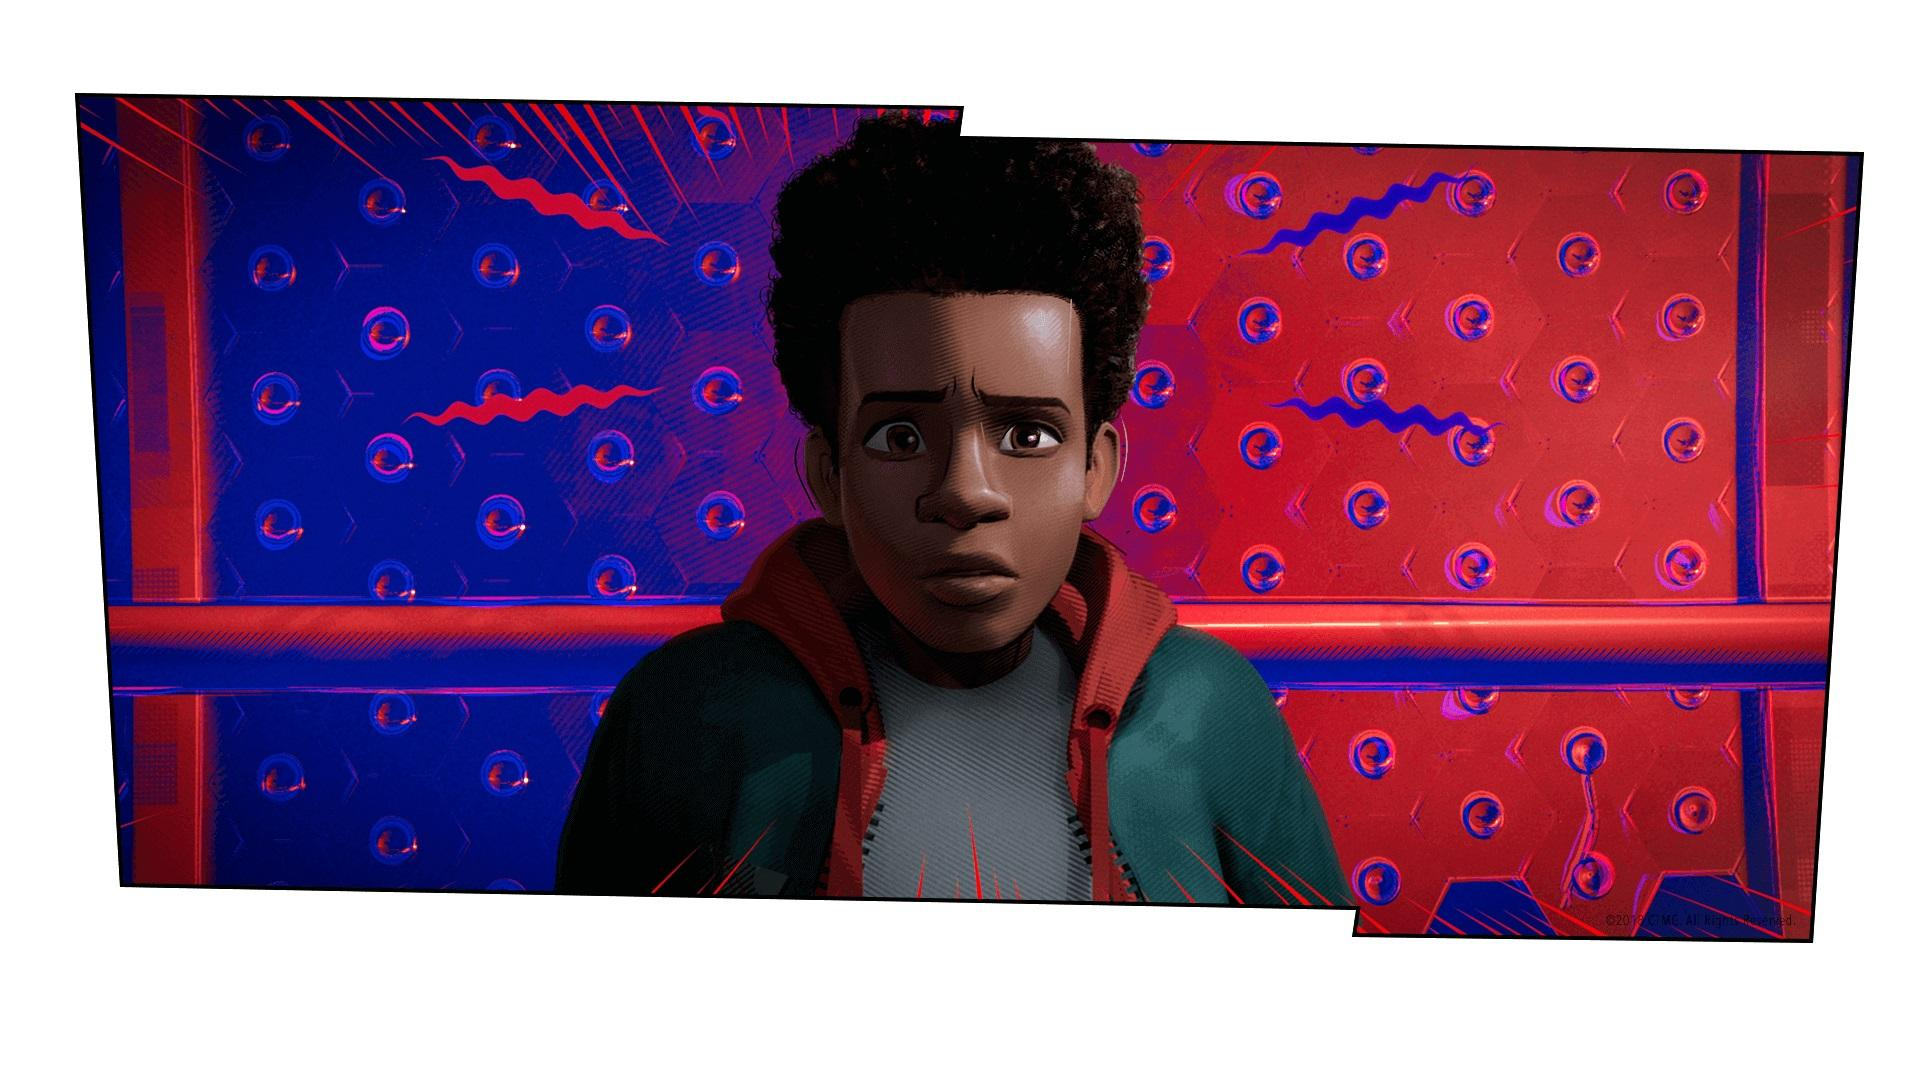 Spider-Man: Into The Spider-Verse 3D (2018) - Financial